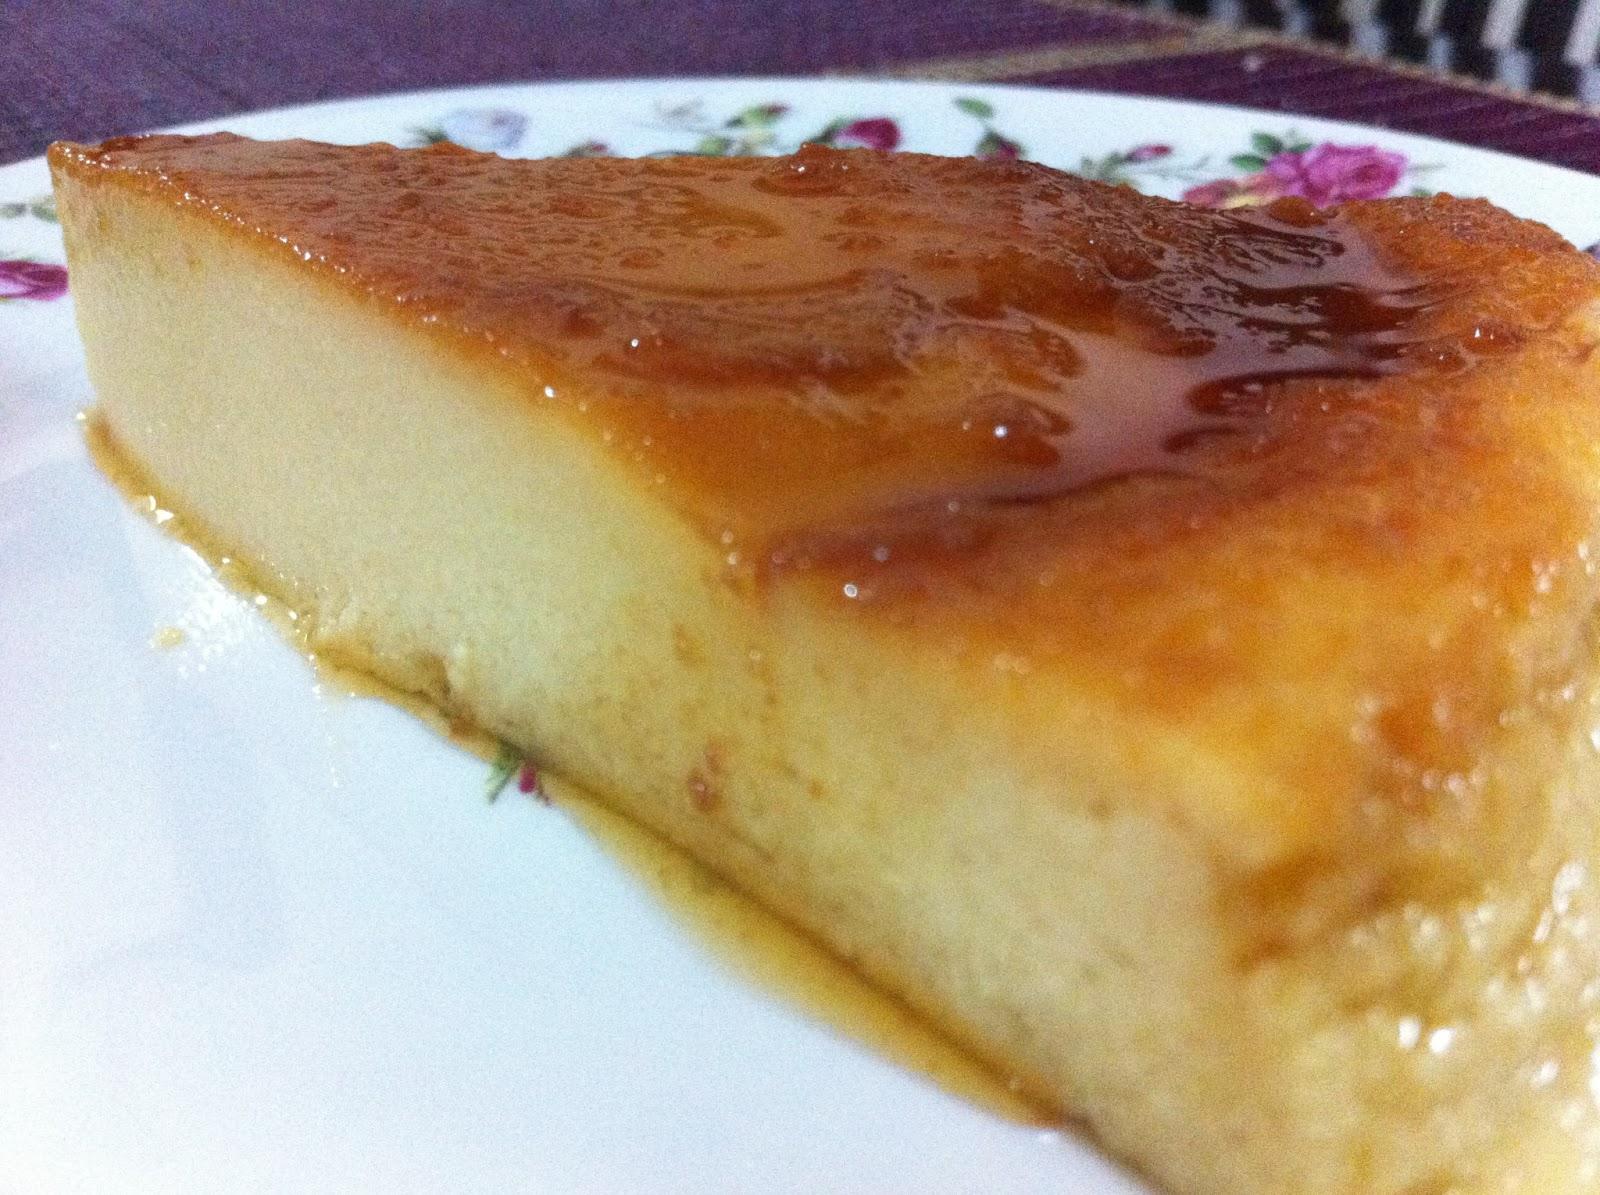 Resepi Puding Roti Karamel Azie Kitchen Copd Blog T